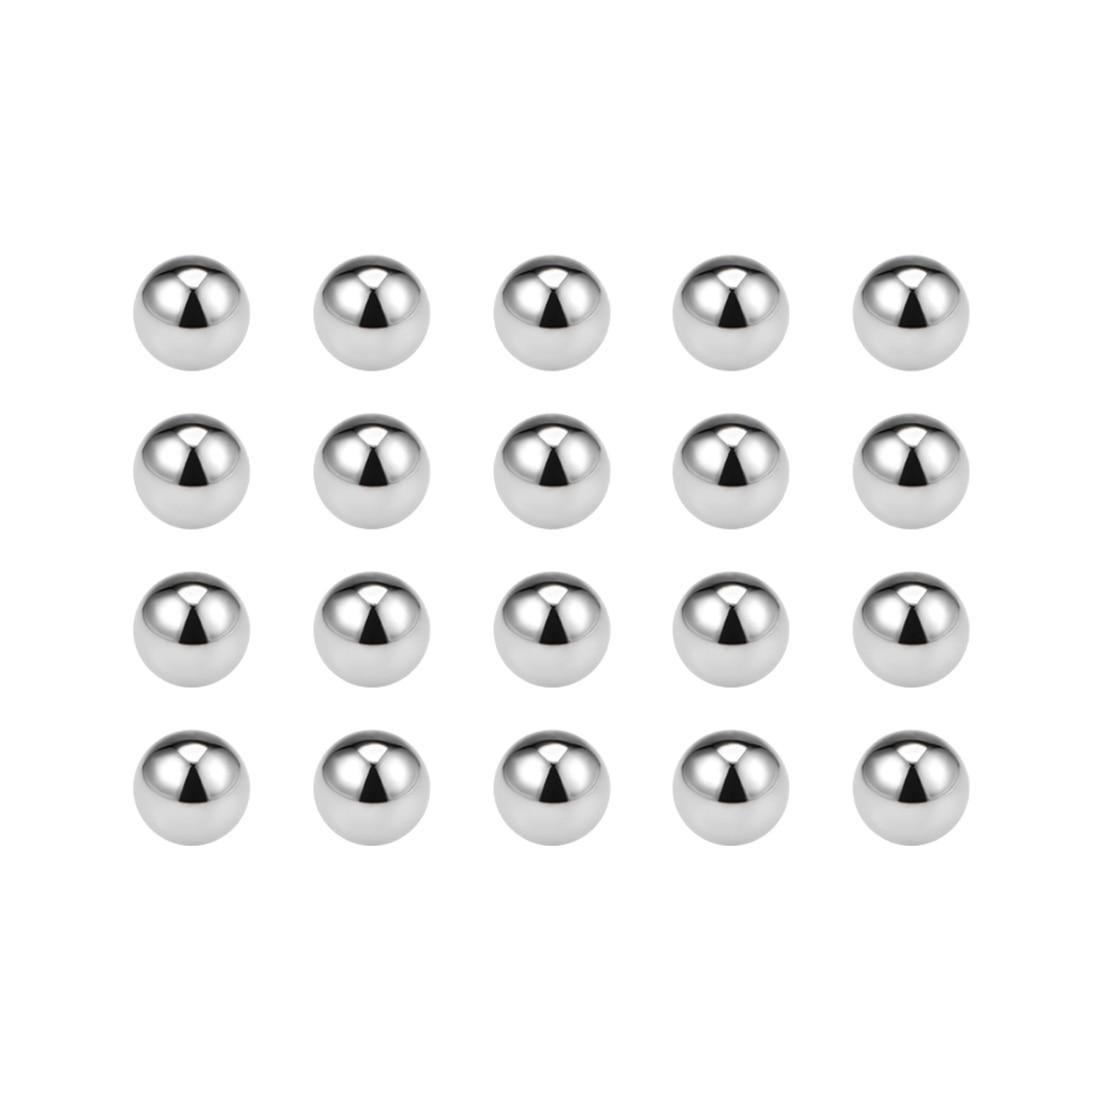 Uxcell 20pcs G10 Precision Bearing Balls 1/1.2/1.5/2.5/3.5/4.5/7.5/7/8/9/10/13mm Metric Chromium Steel Balls